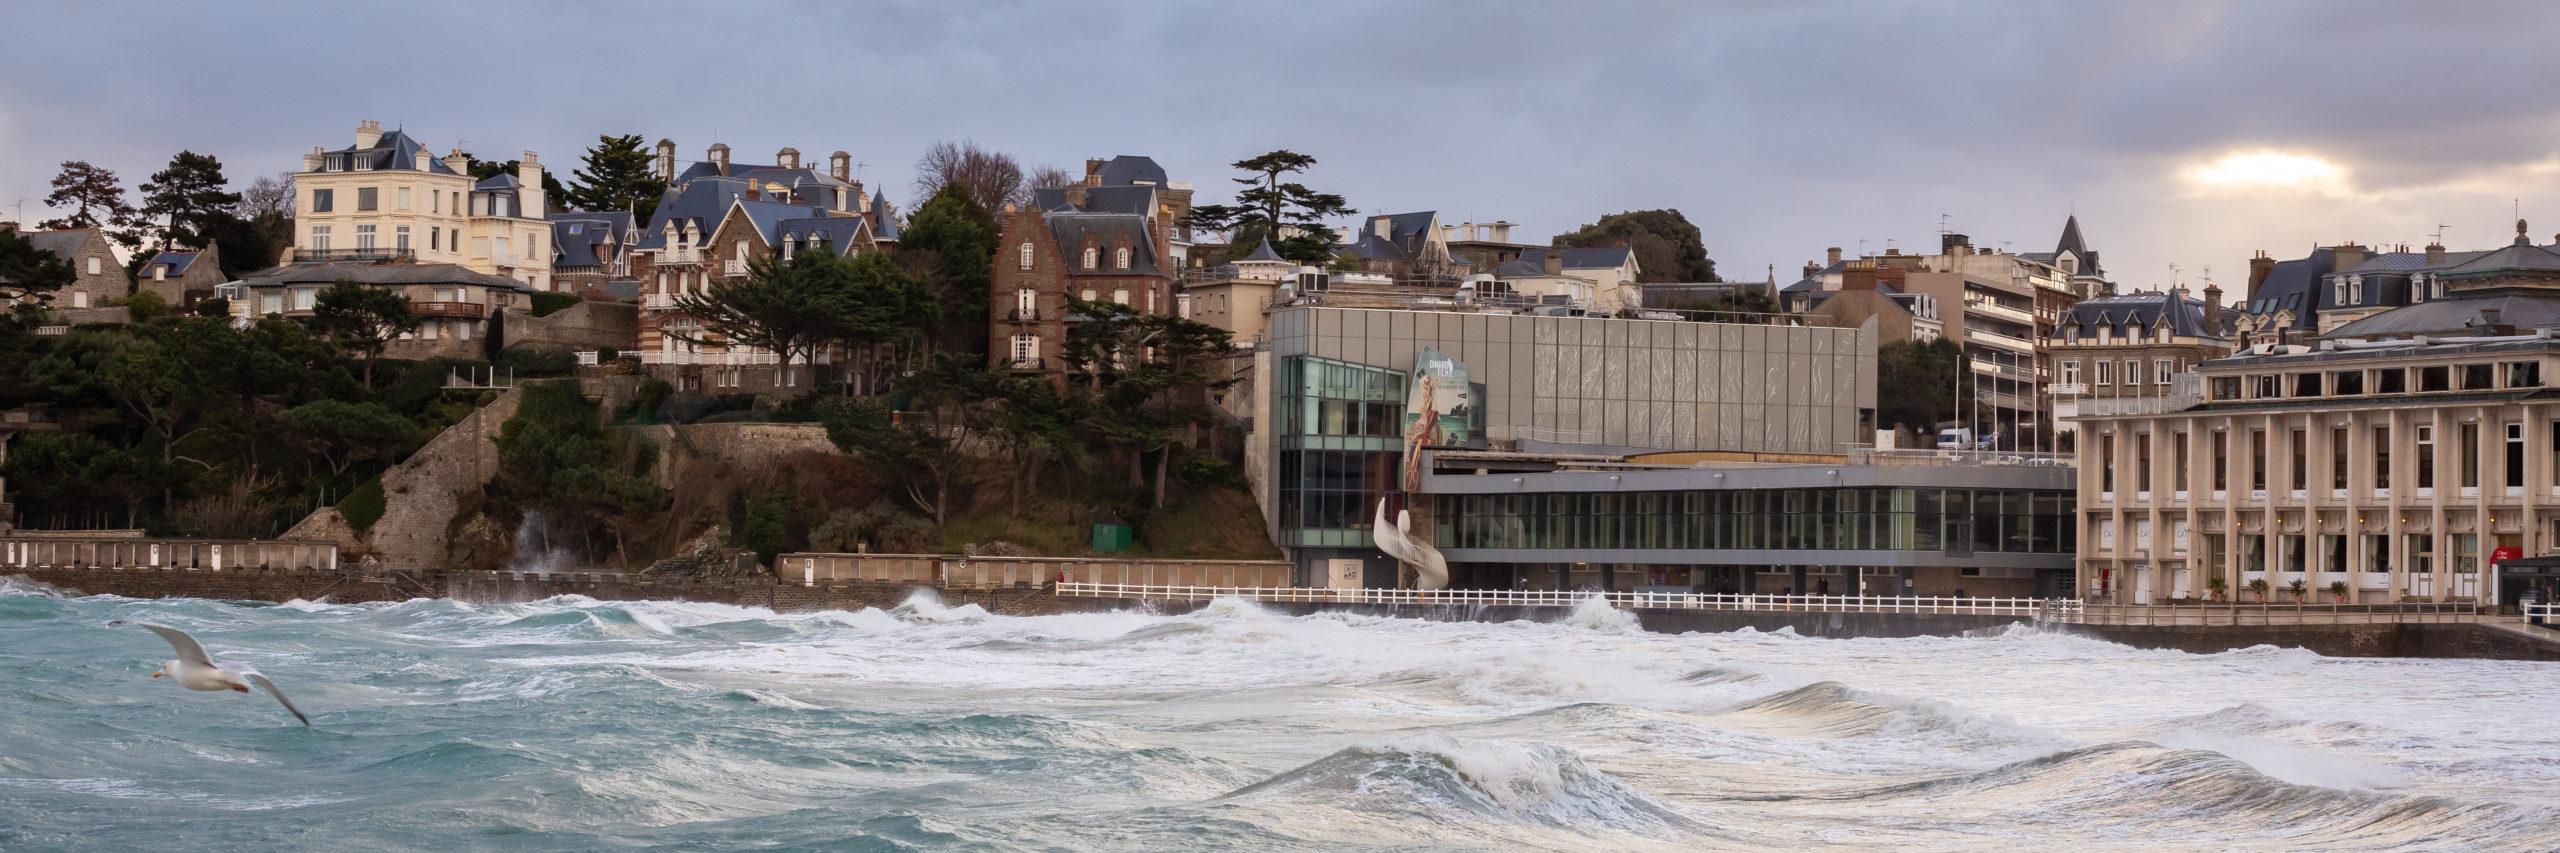 grande marée Dinard tempête